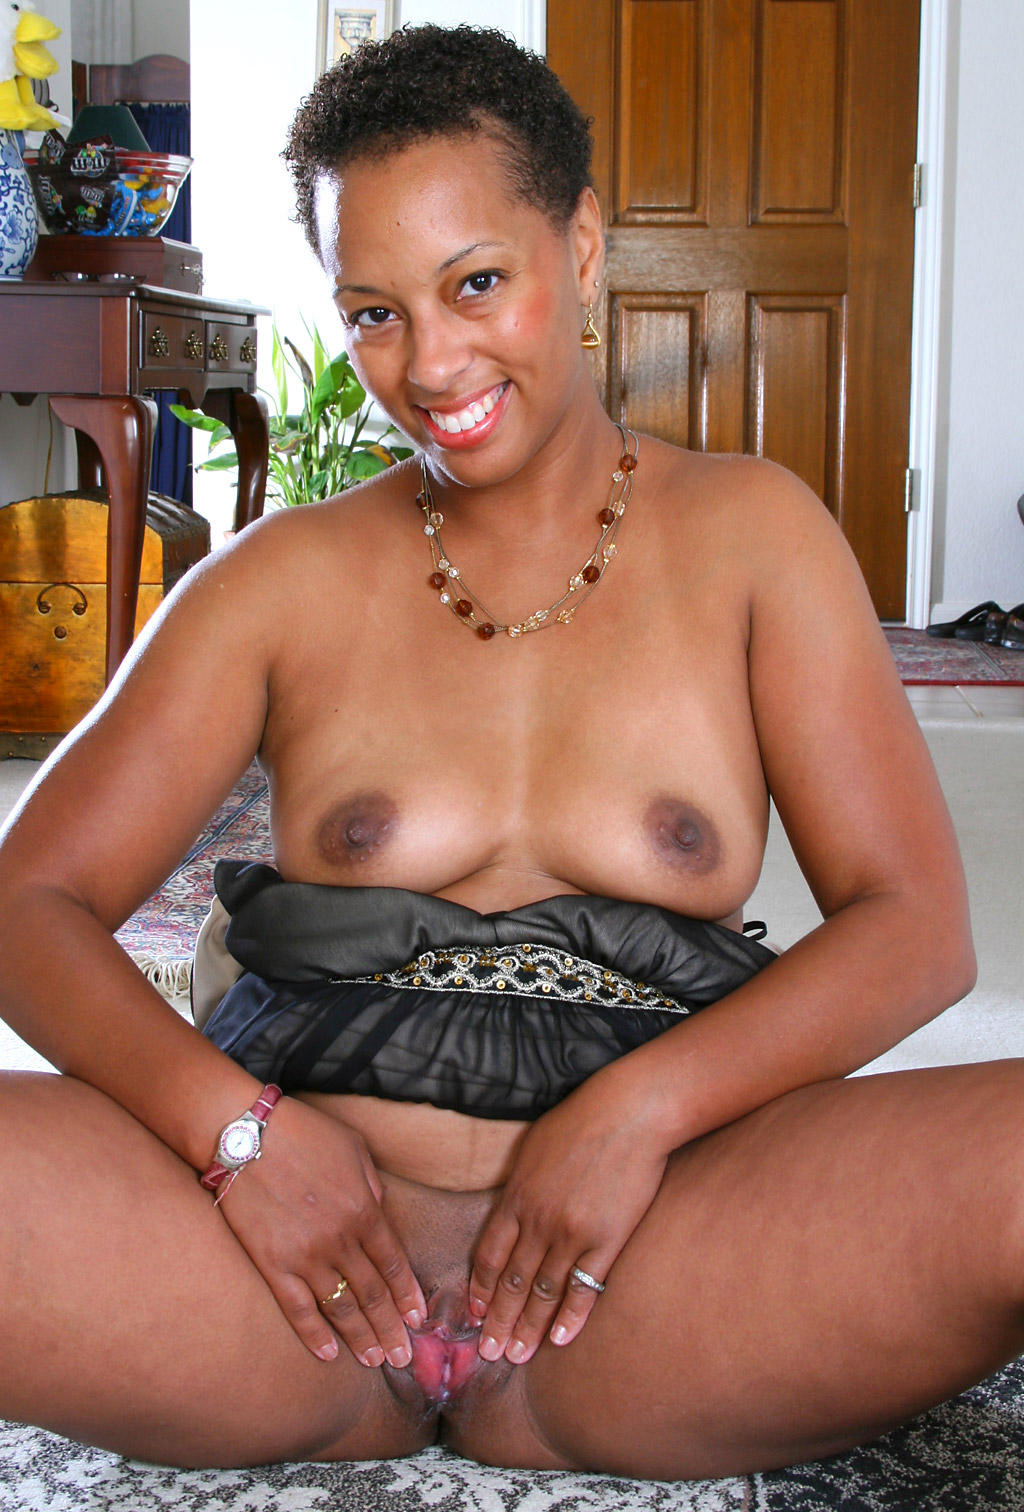 Black hairy pussy women